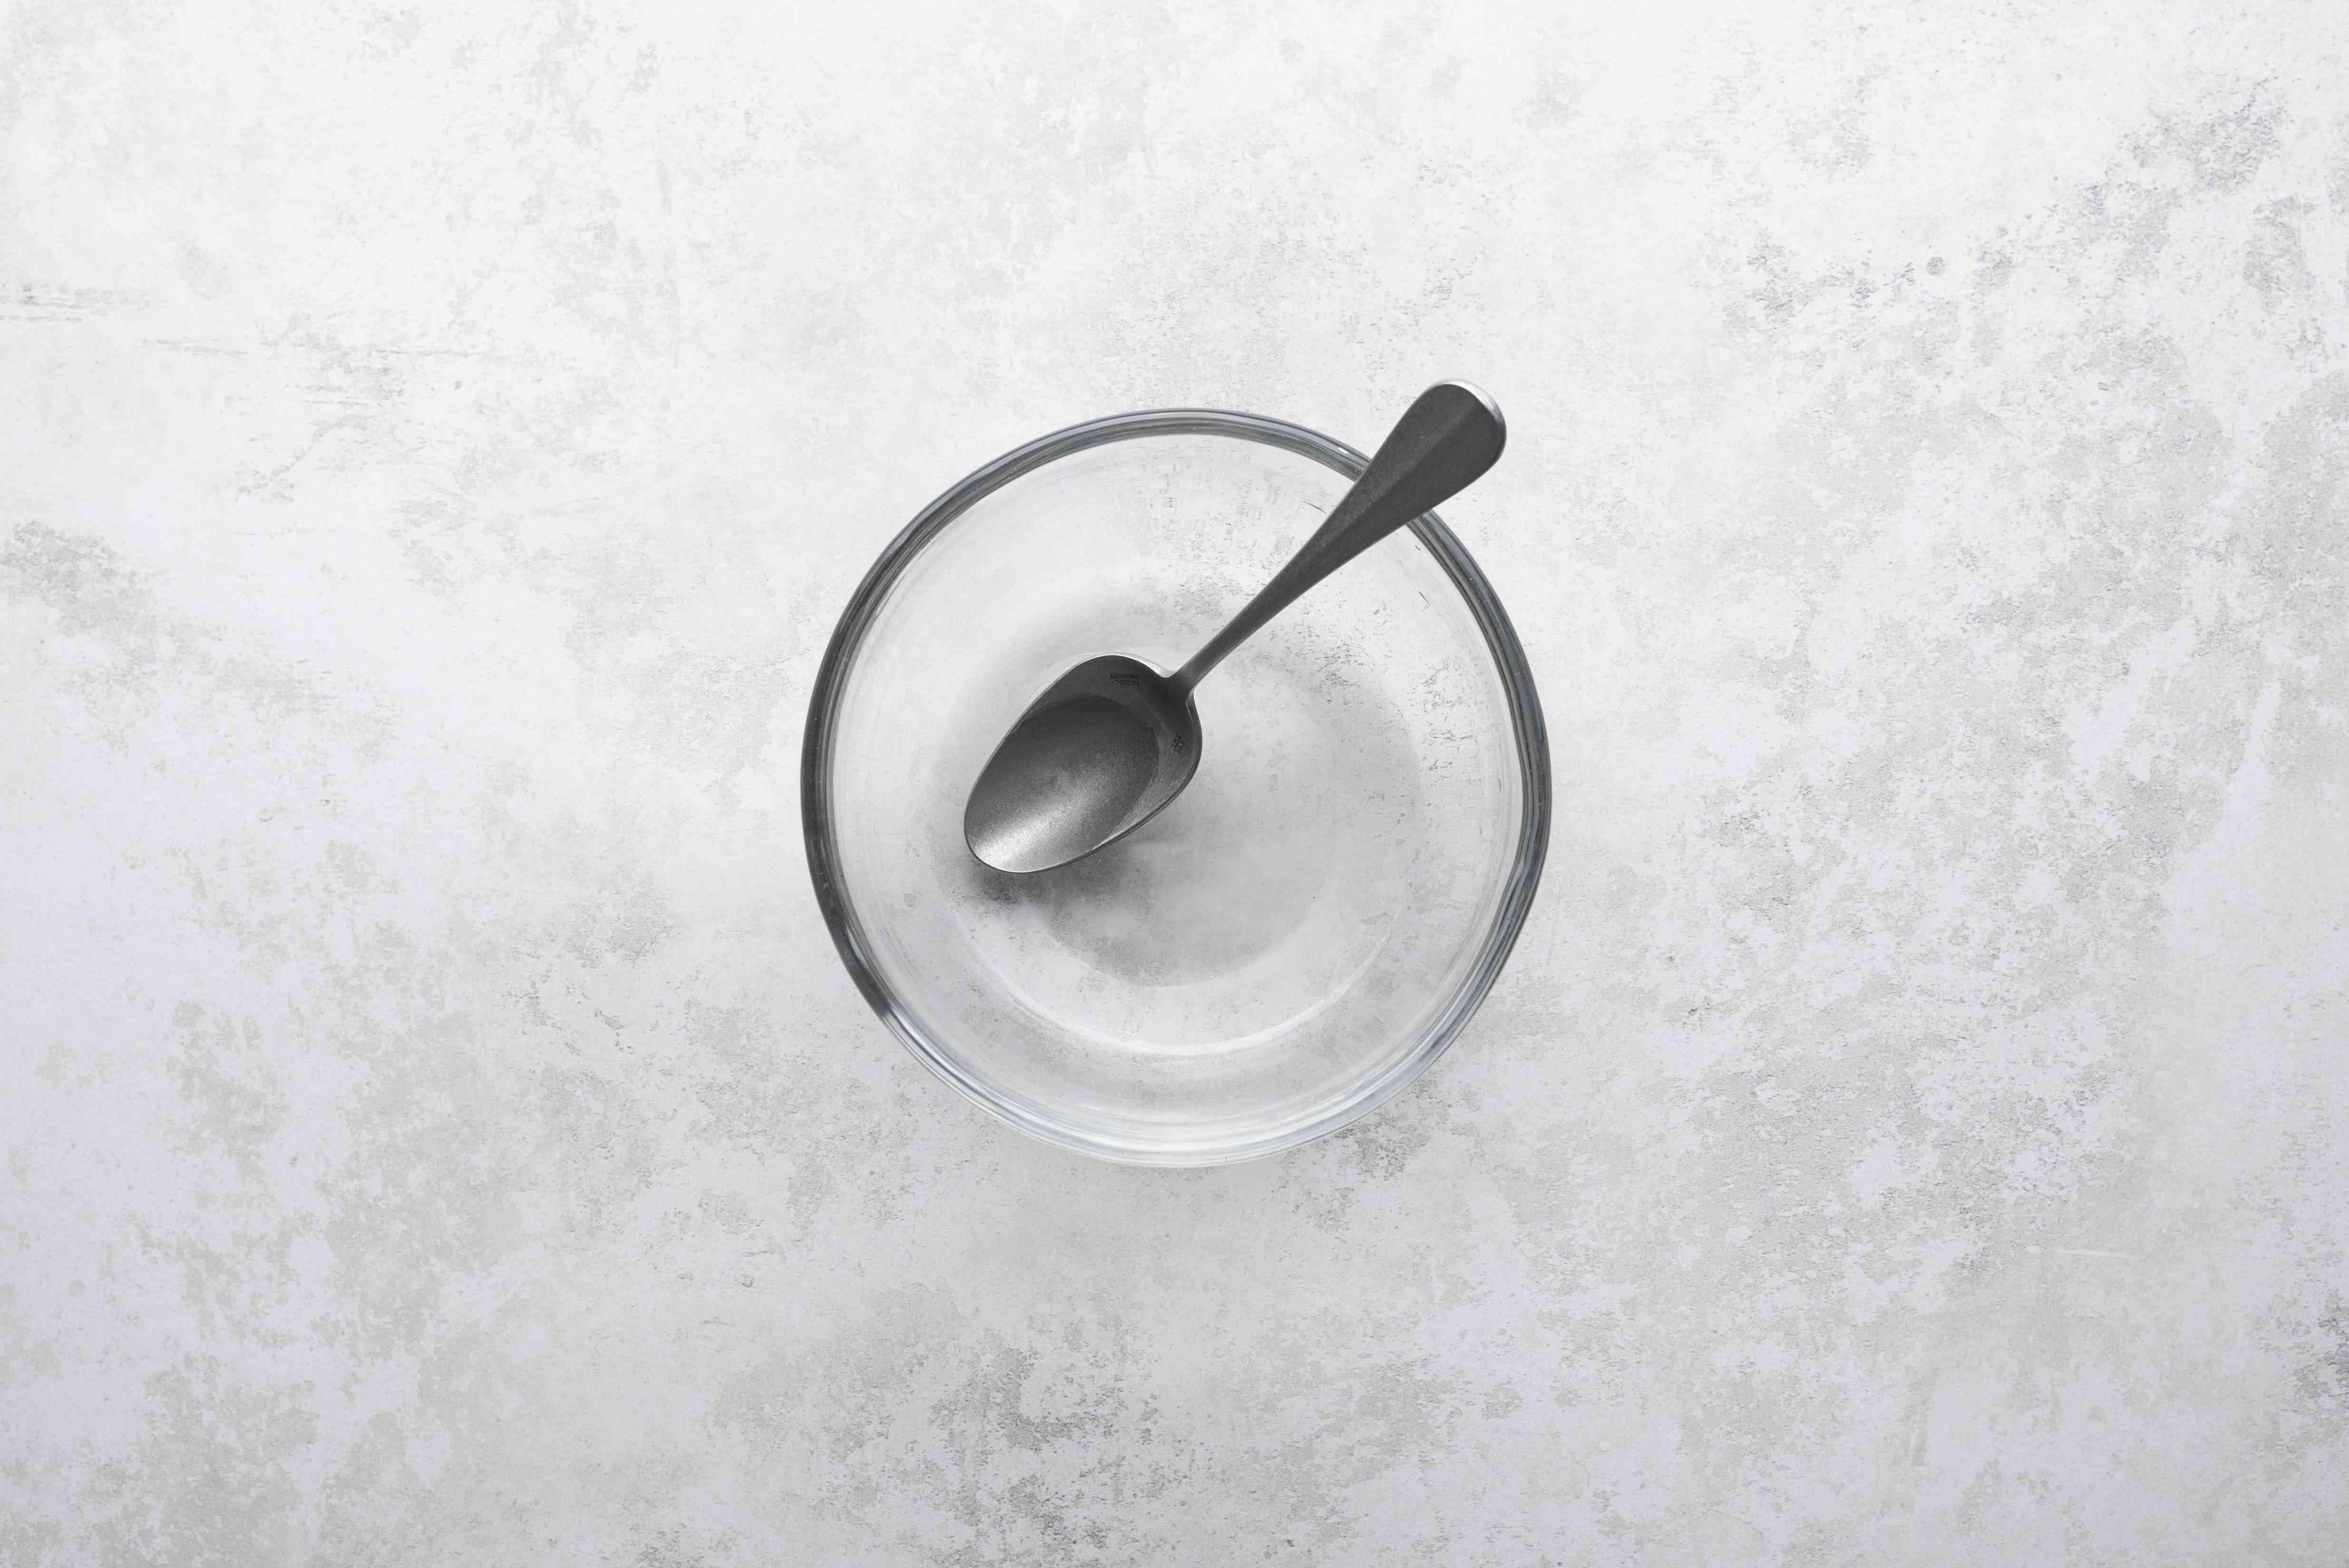 Dissolve baking soda in a bowl